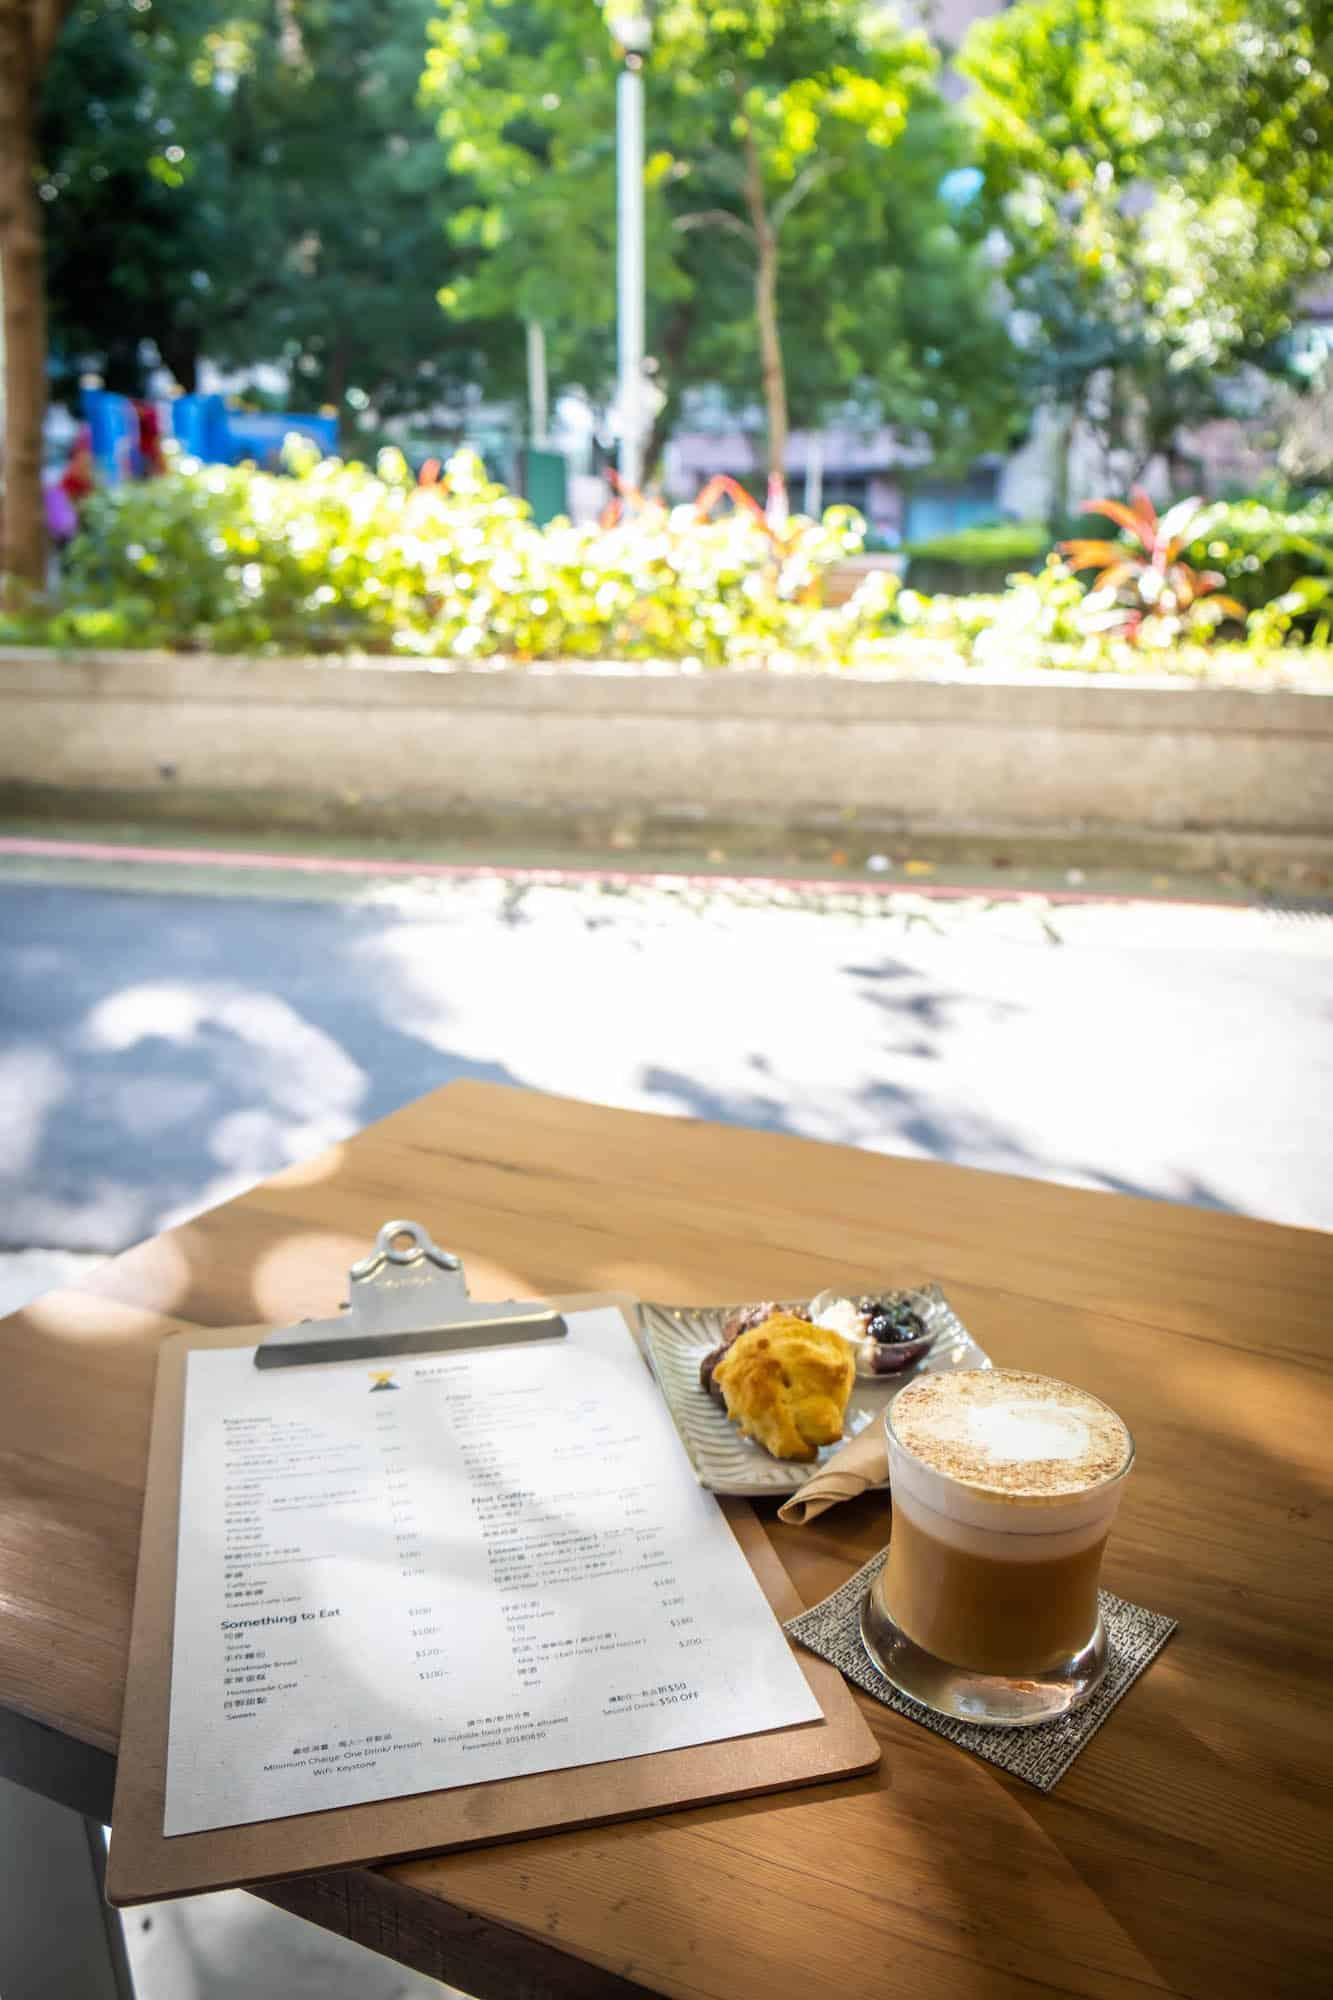 Travel Taiwan - Coffee in Park